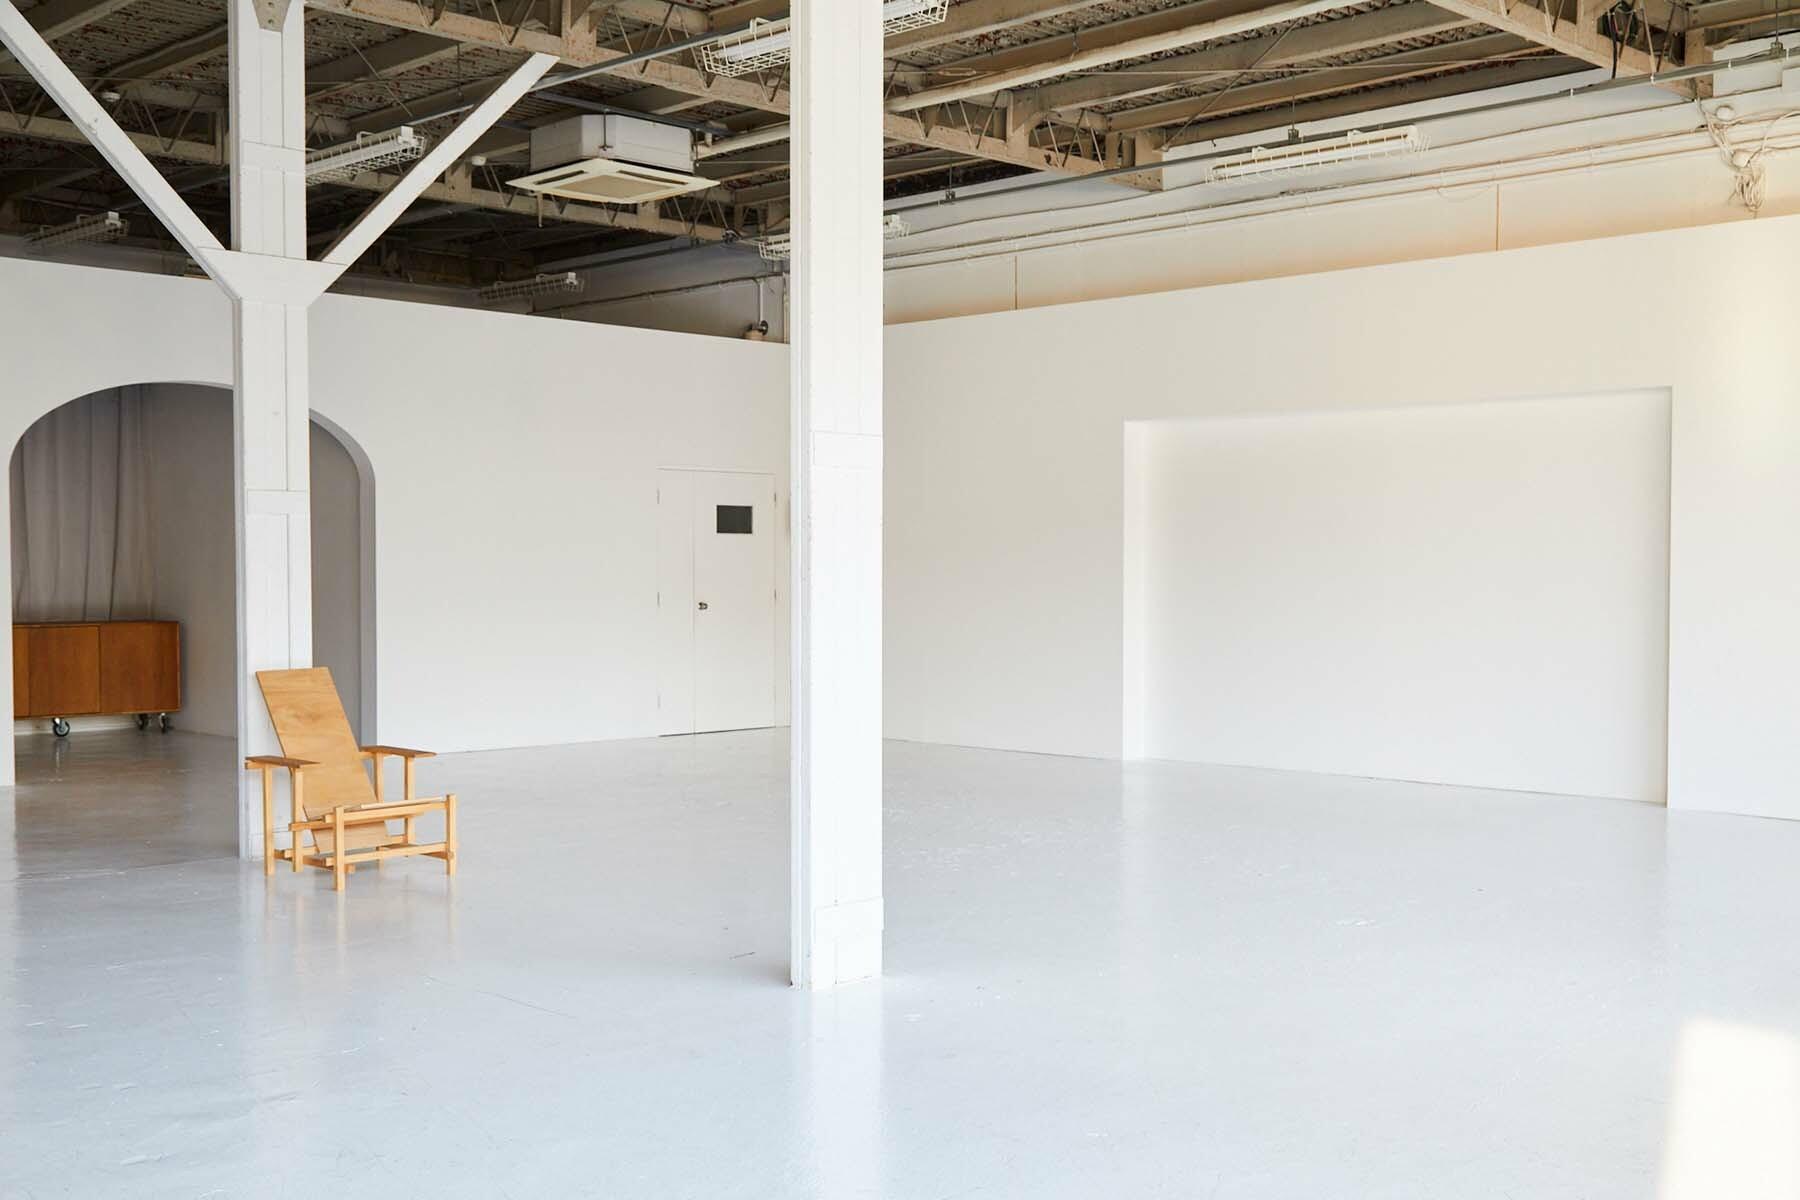 HOXTON STUDIO Loft/Garage (ホクストンスタジオ ロフト/ガレージ)Loft(2F) メイク室